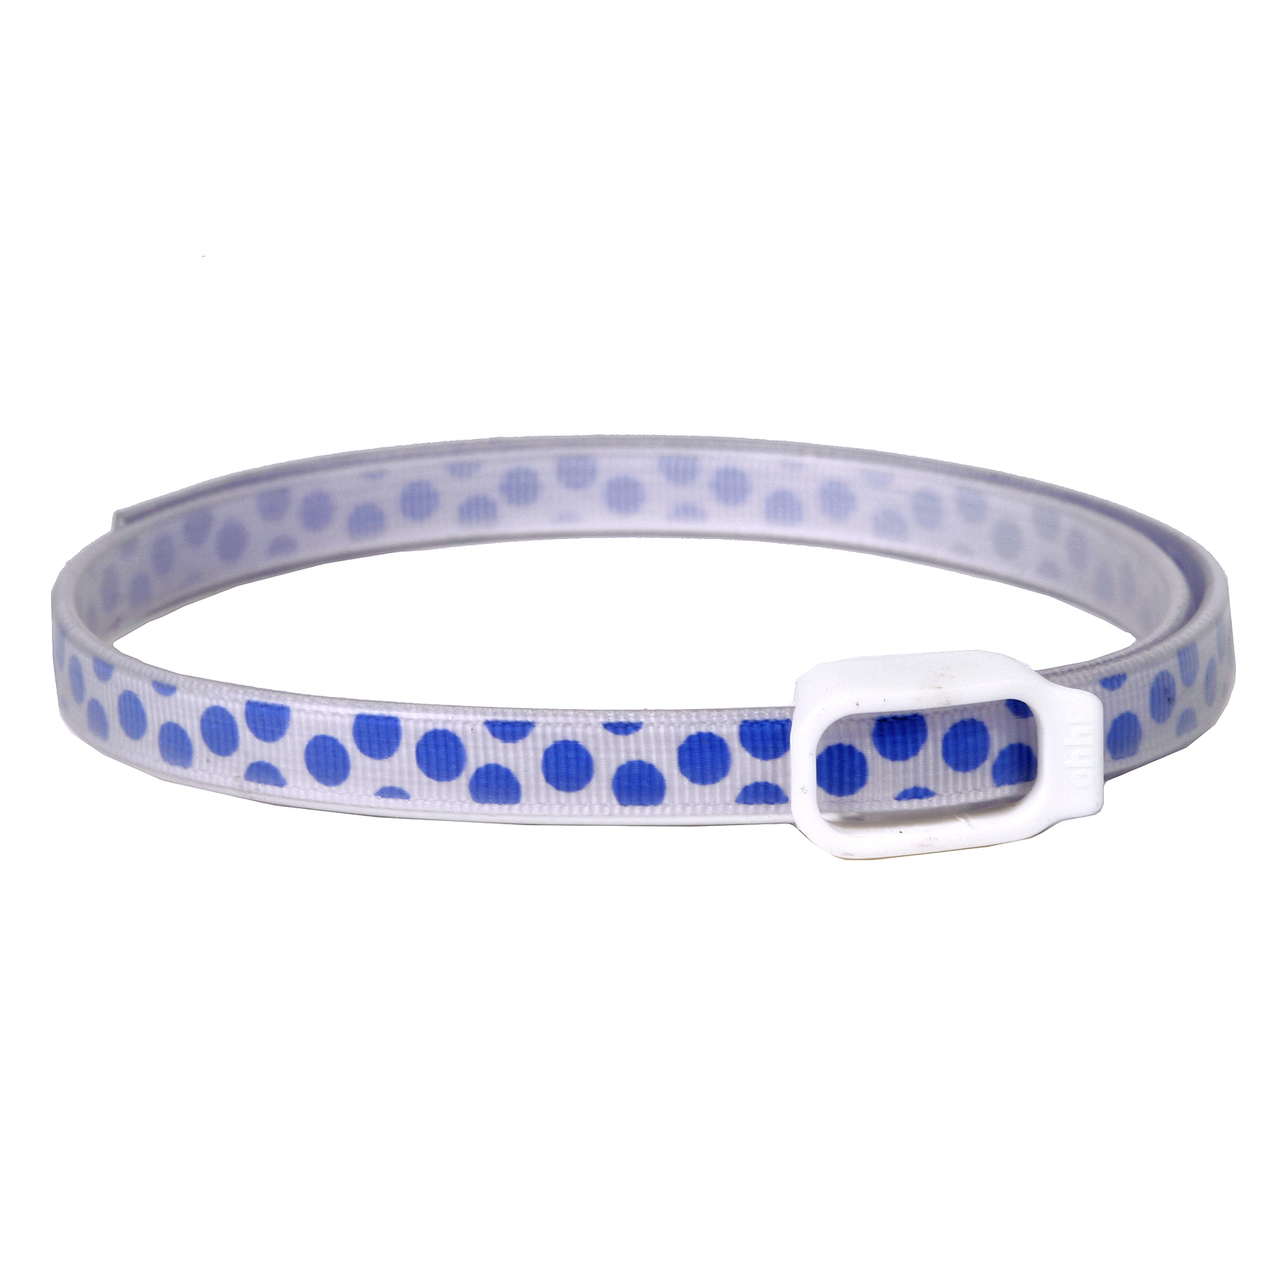 Essential Oils Dog Collar - Blue Polka Dot